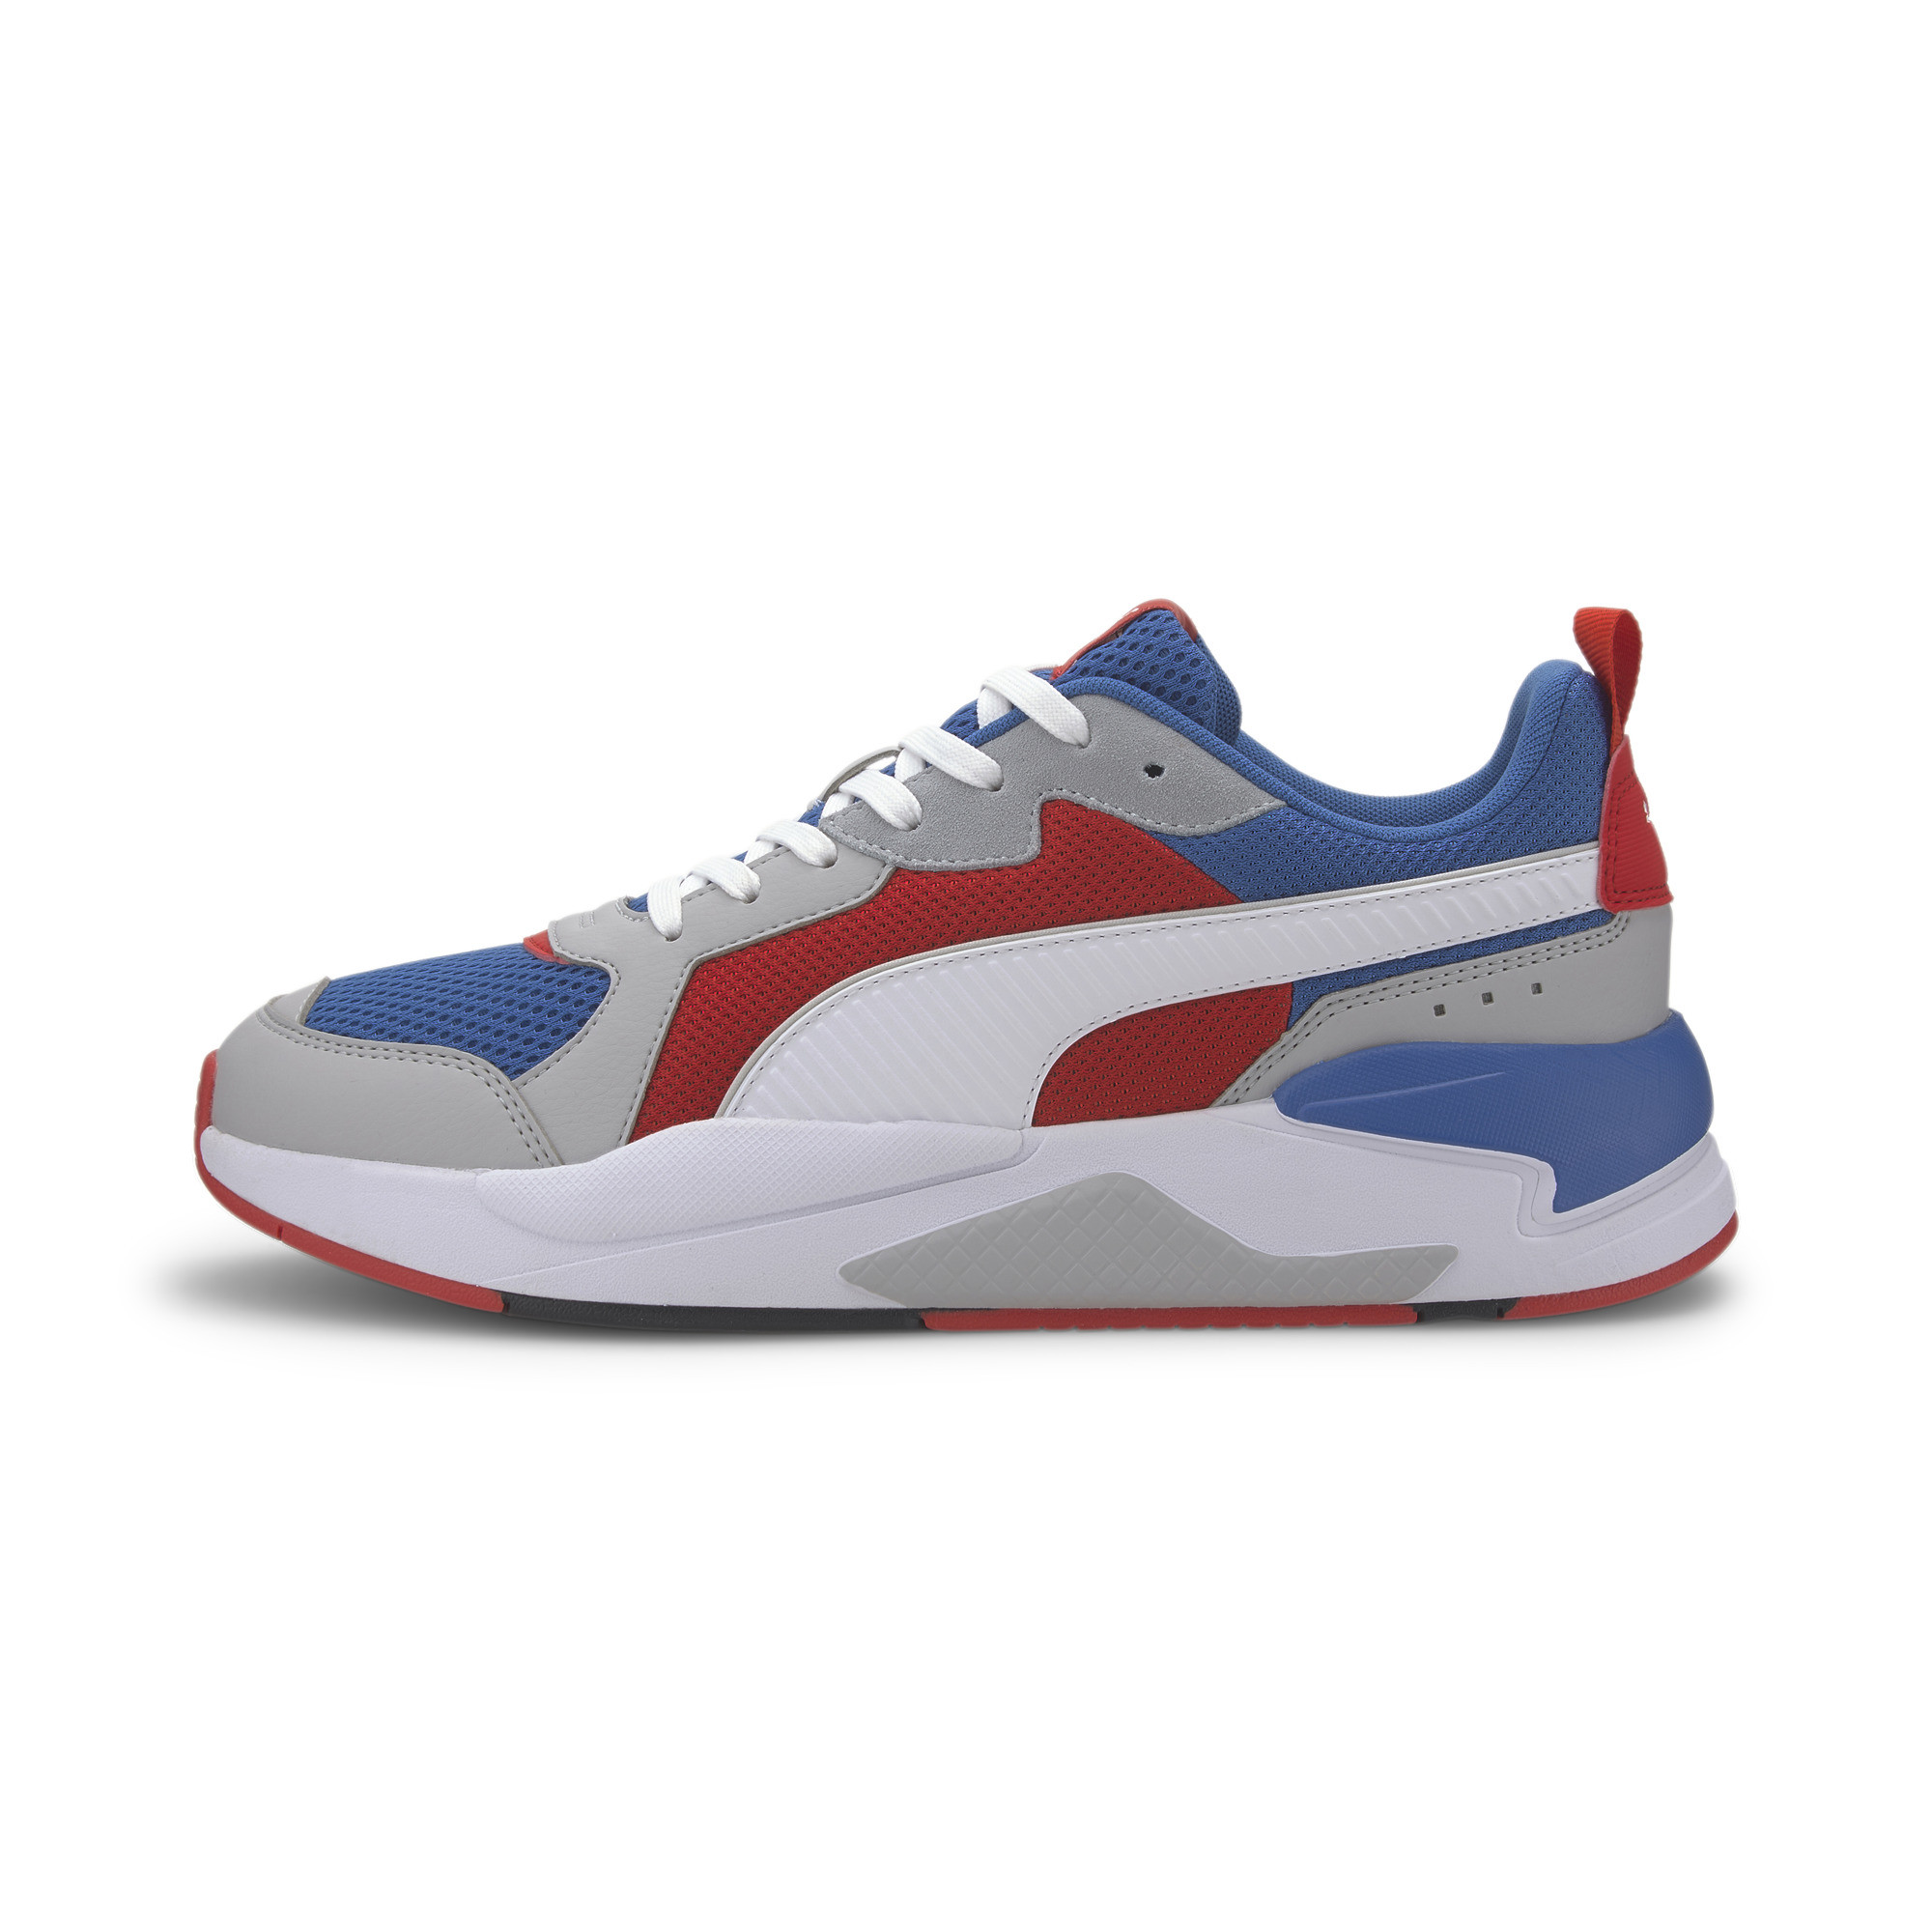 PUMA-Men-039-s-X-RAY-Sneakers thumbnail 11